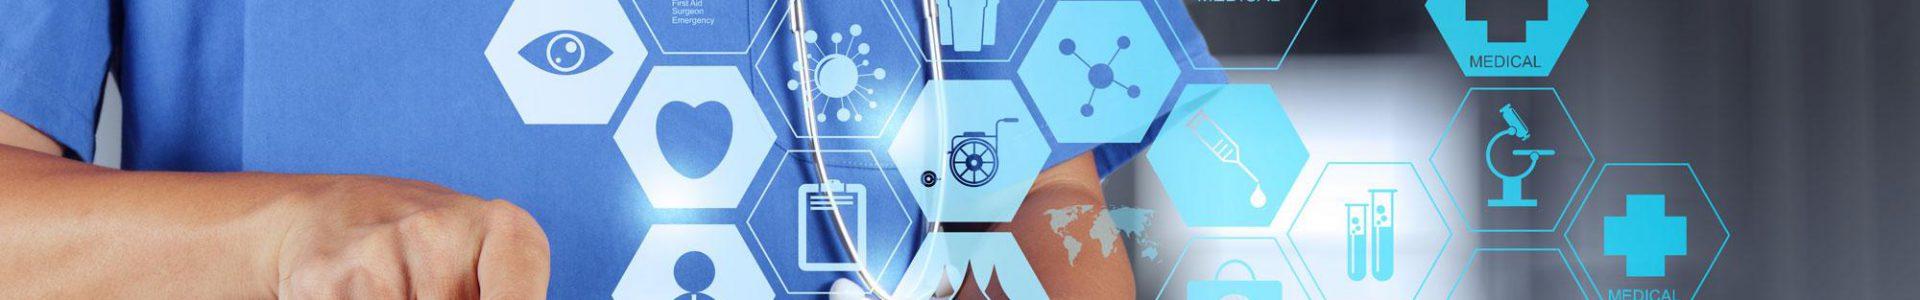 saude-e-tecnologia